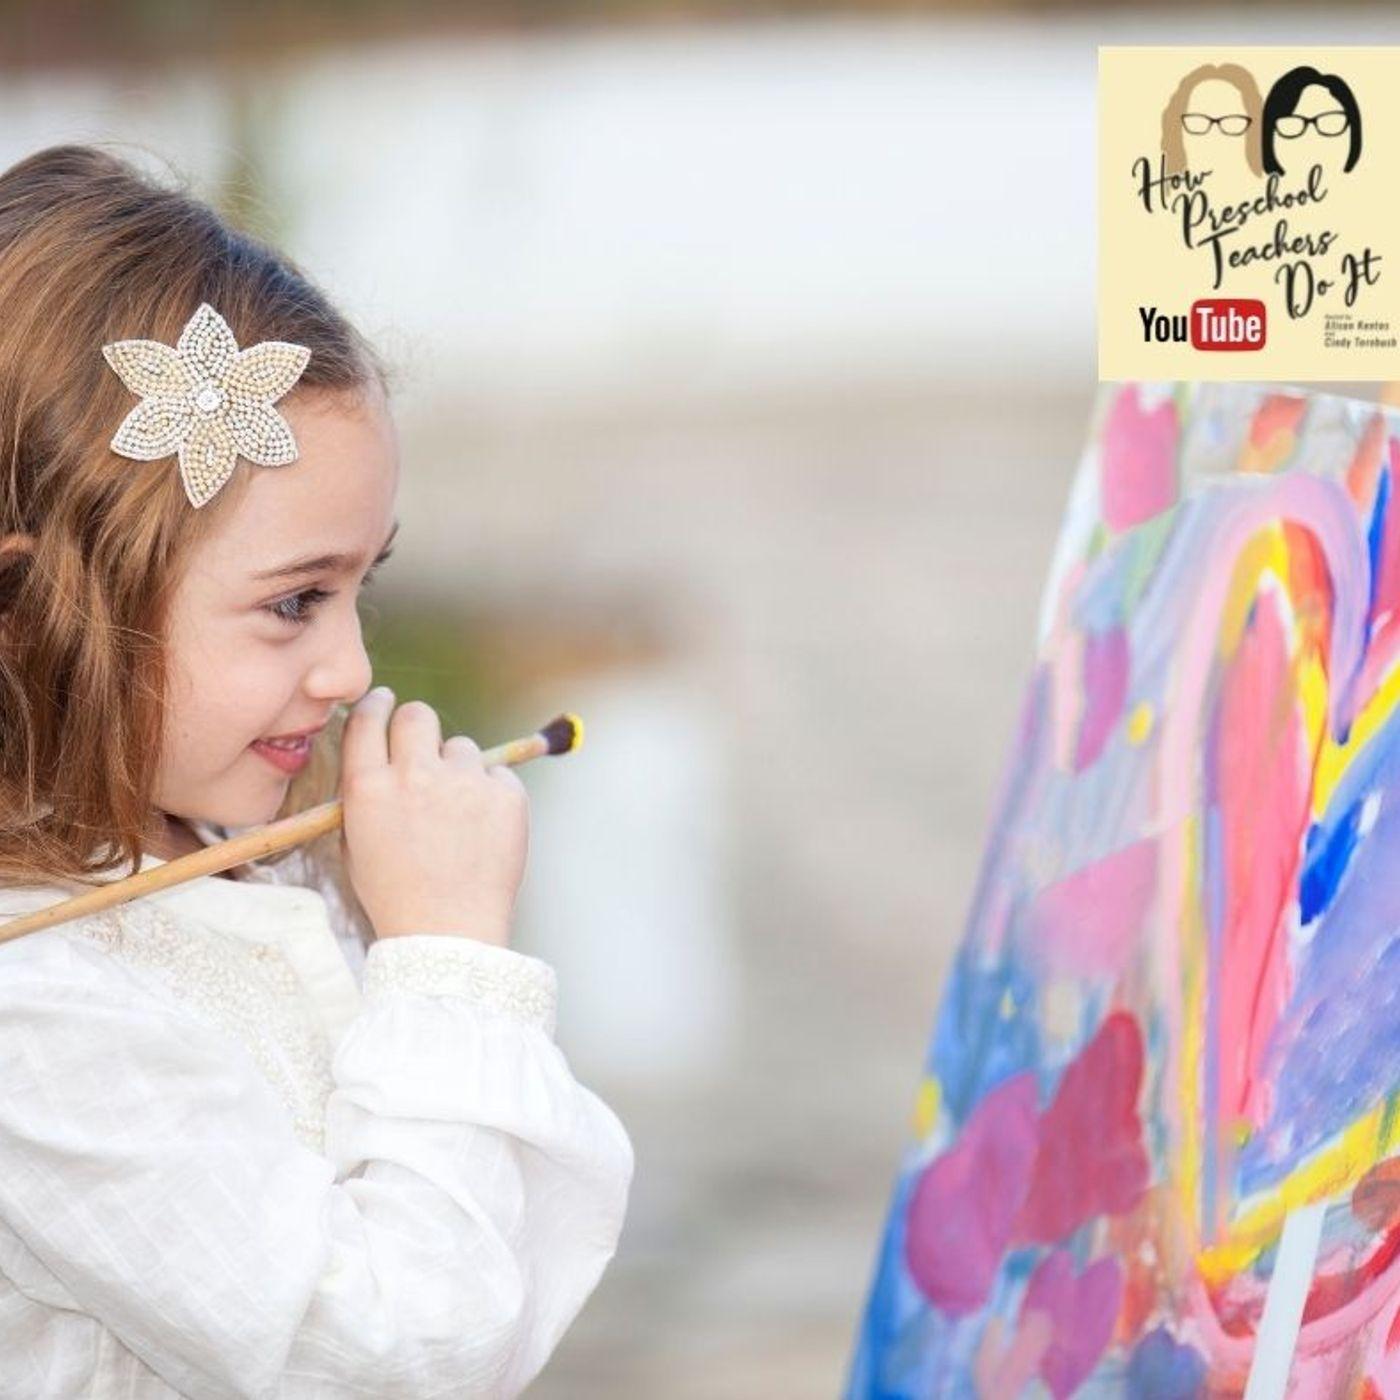 135: Why the Creative Arts Matter in Preschool